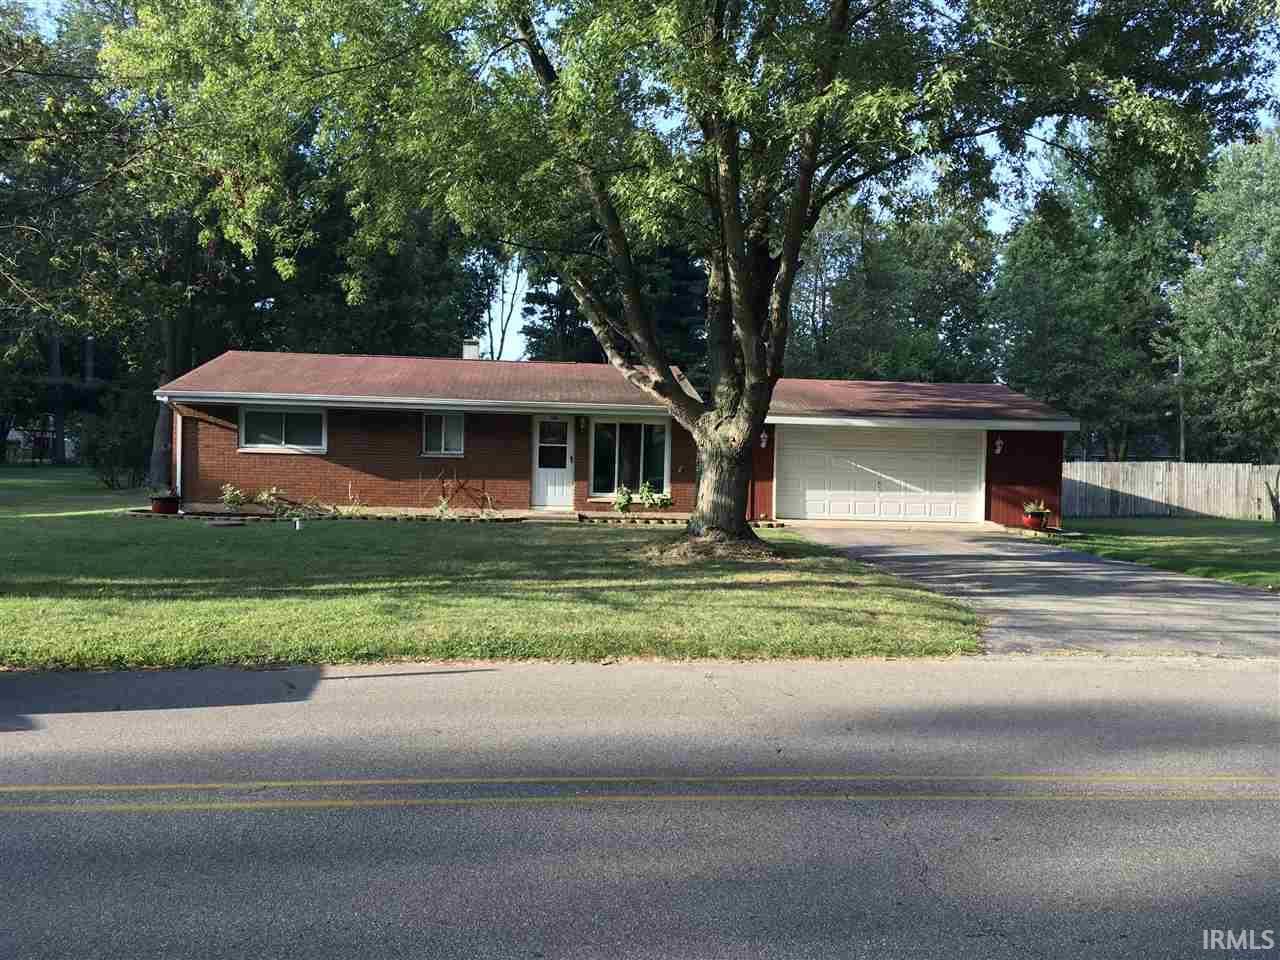 508 W Adams Osceola, IN 46561